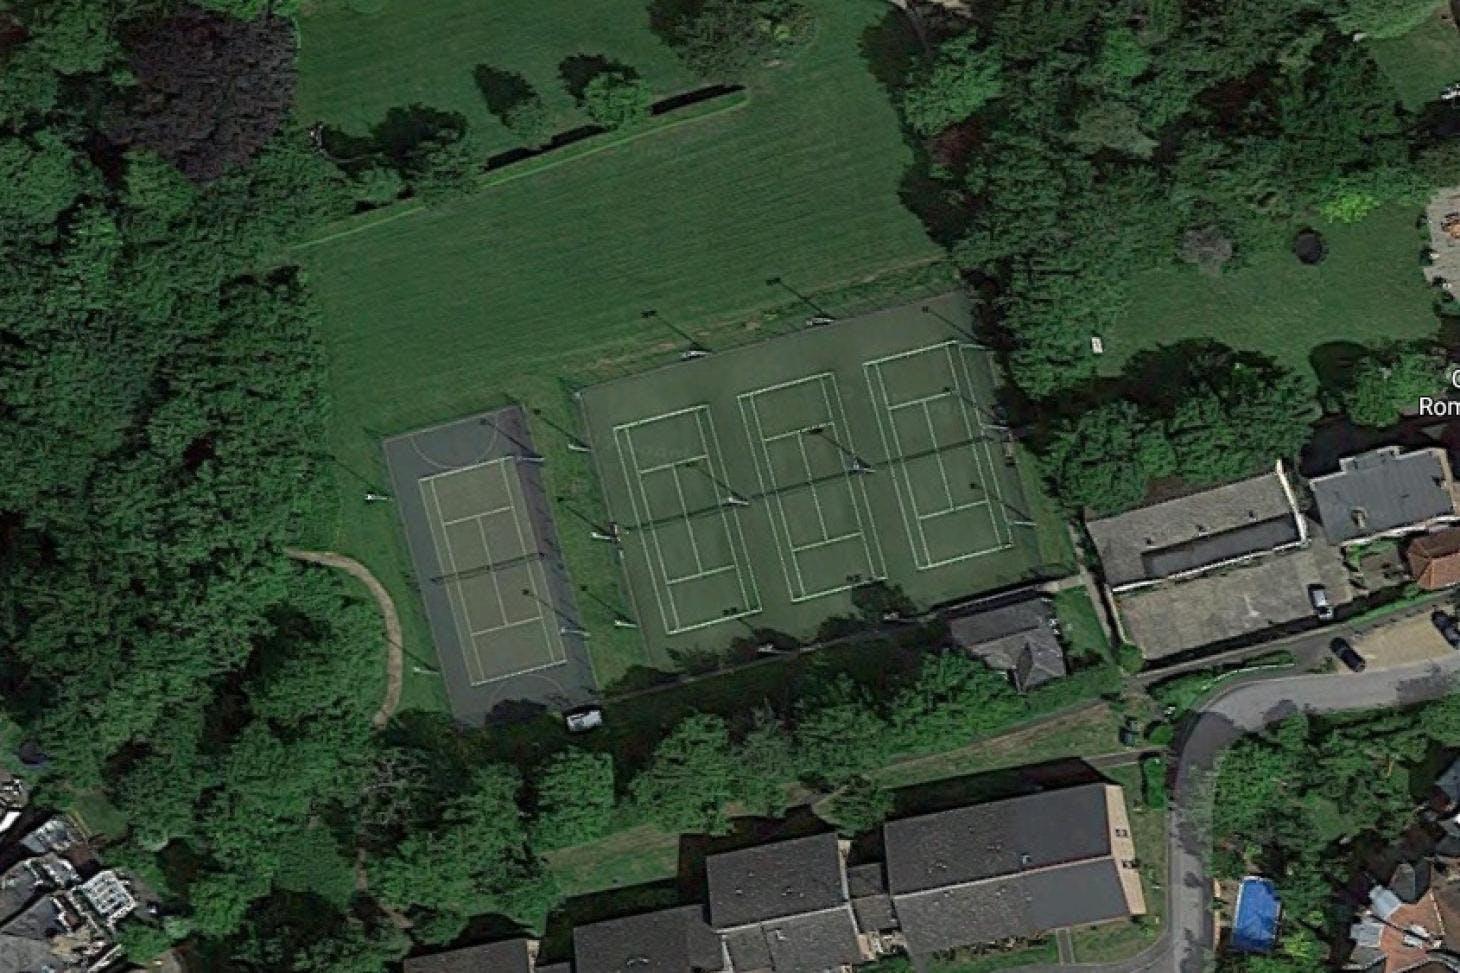 Muswell Hill Methodist LTC Outdoor | Astroturf tennis court